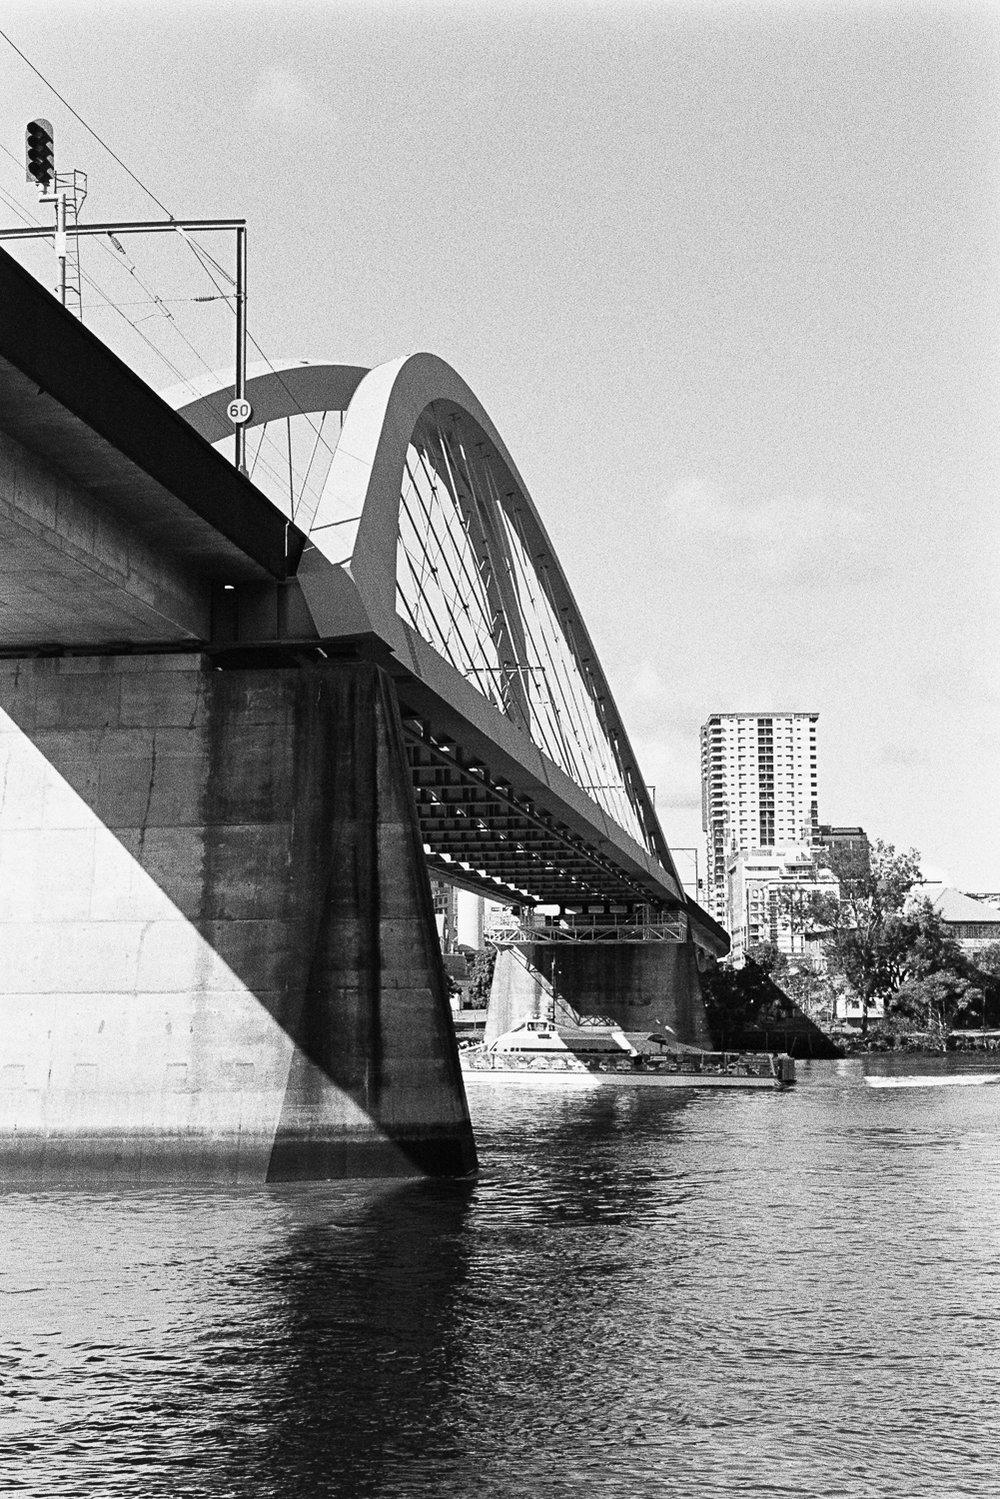 That train bridge…